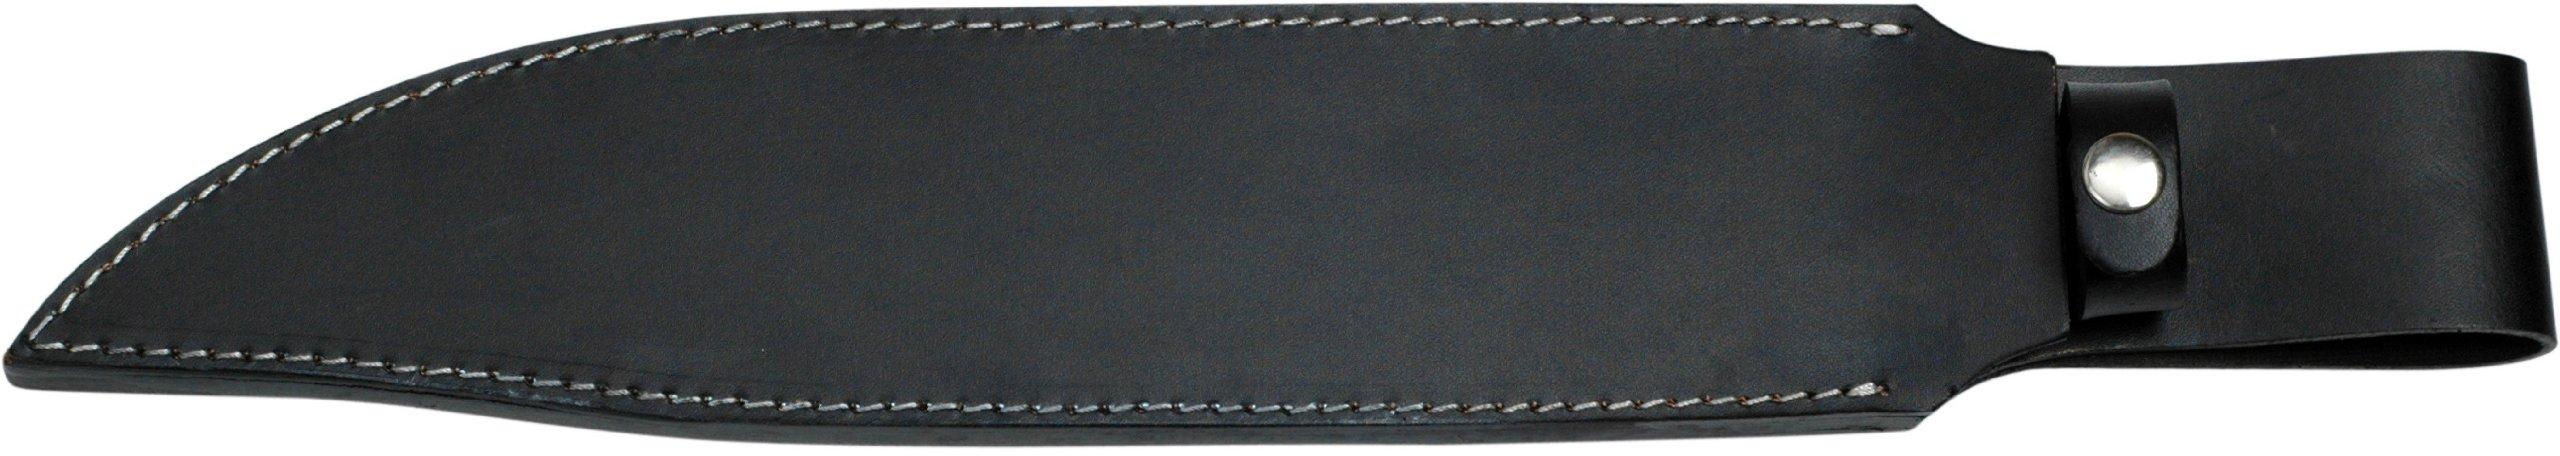 MTECH USA XTREME MX-8070-MC Mx-8070 Fixed Blade Knife, 18'' Overall